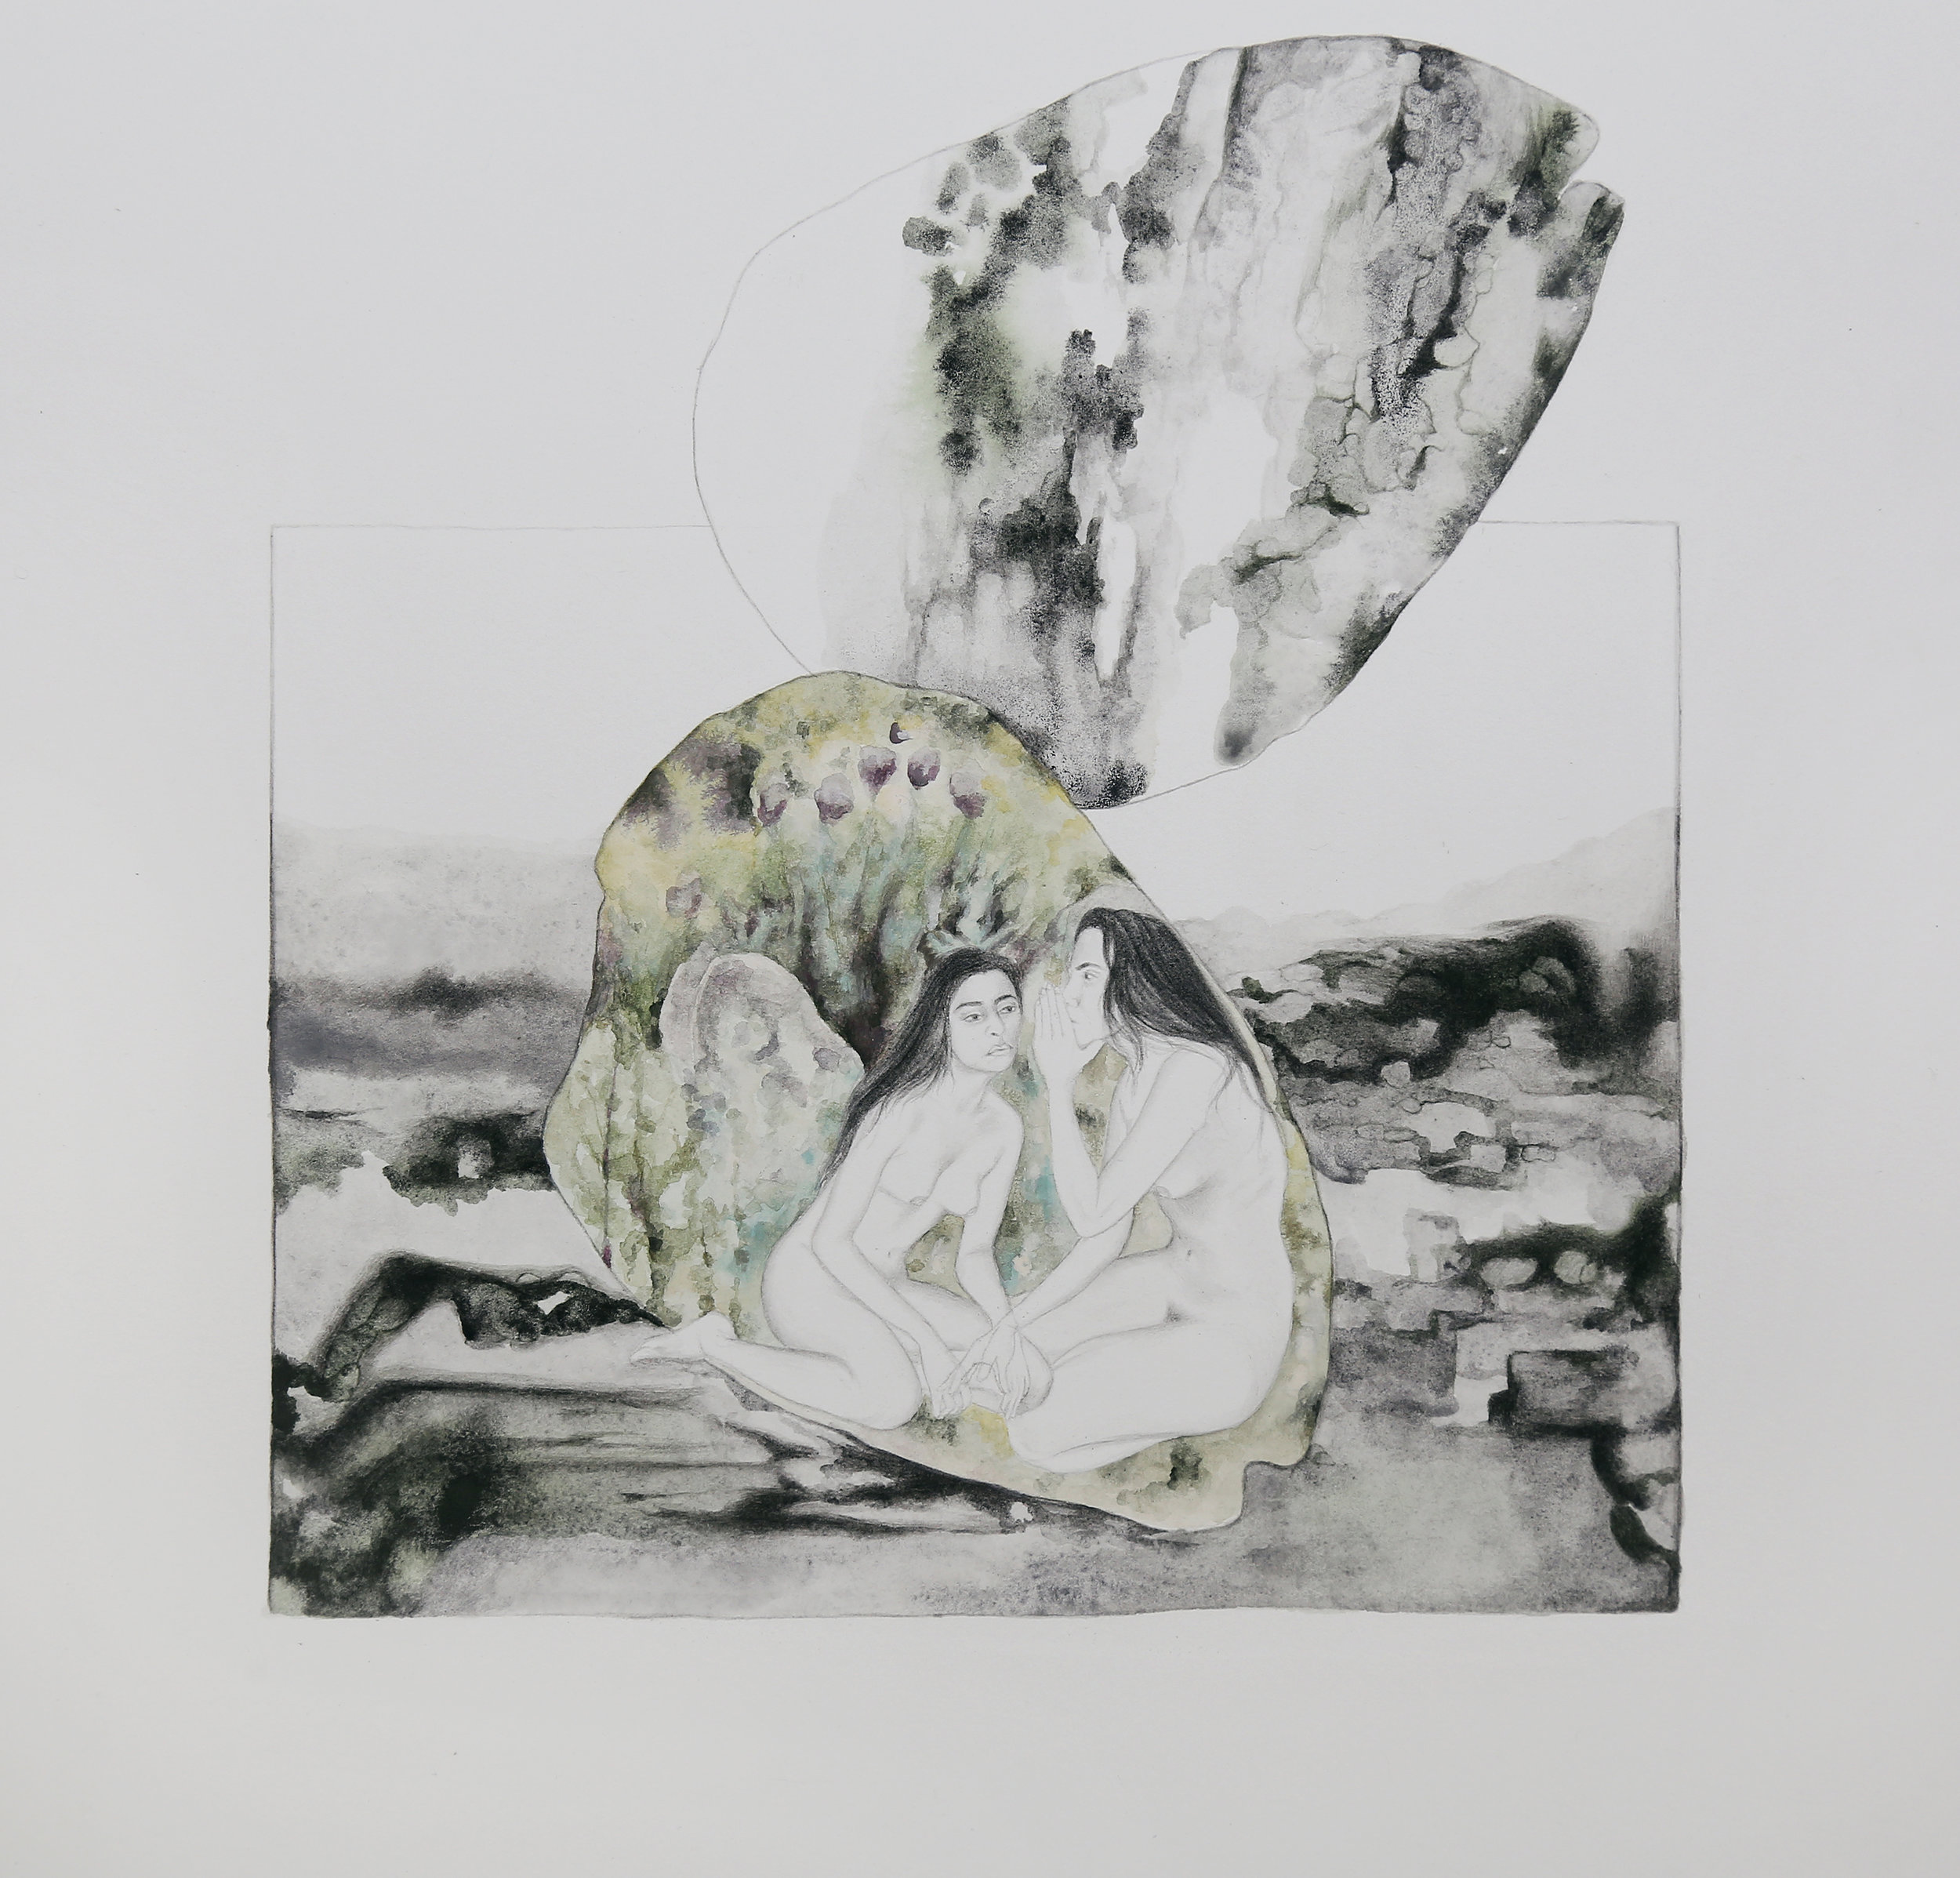 A Precarious Conversation   Gouache on paper  28 x 26 cm  2017